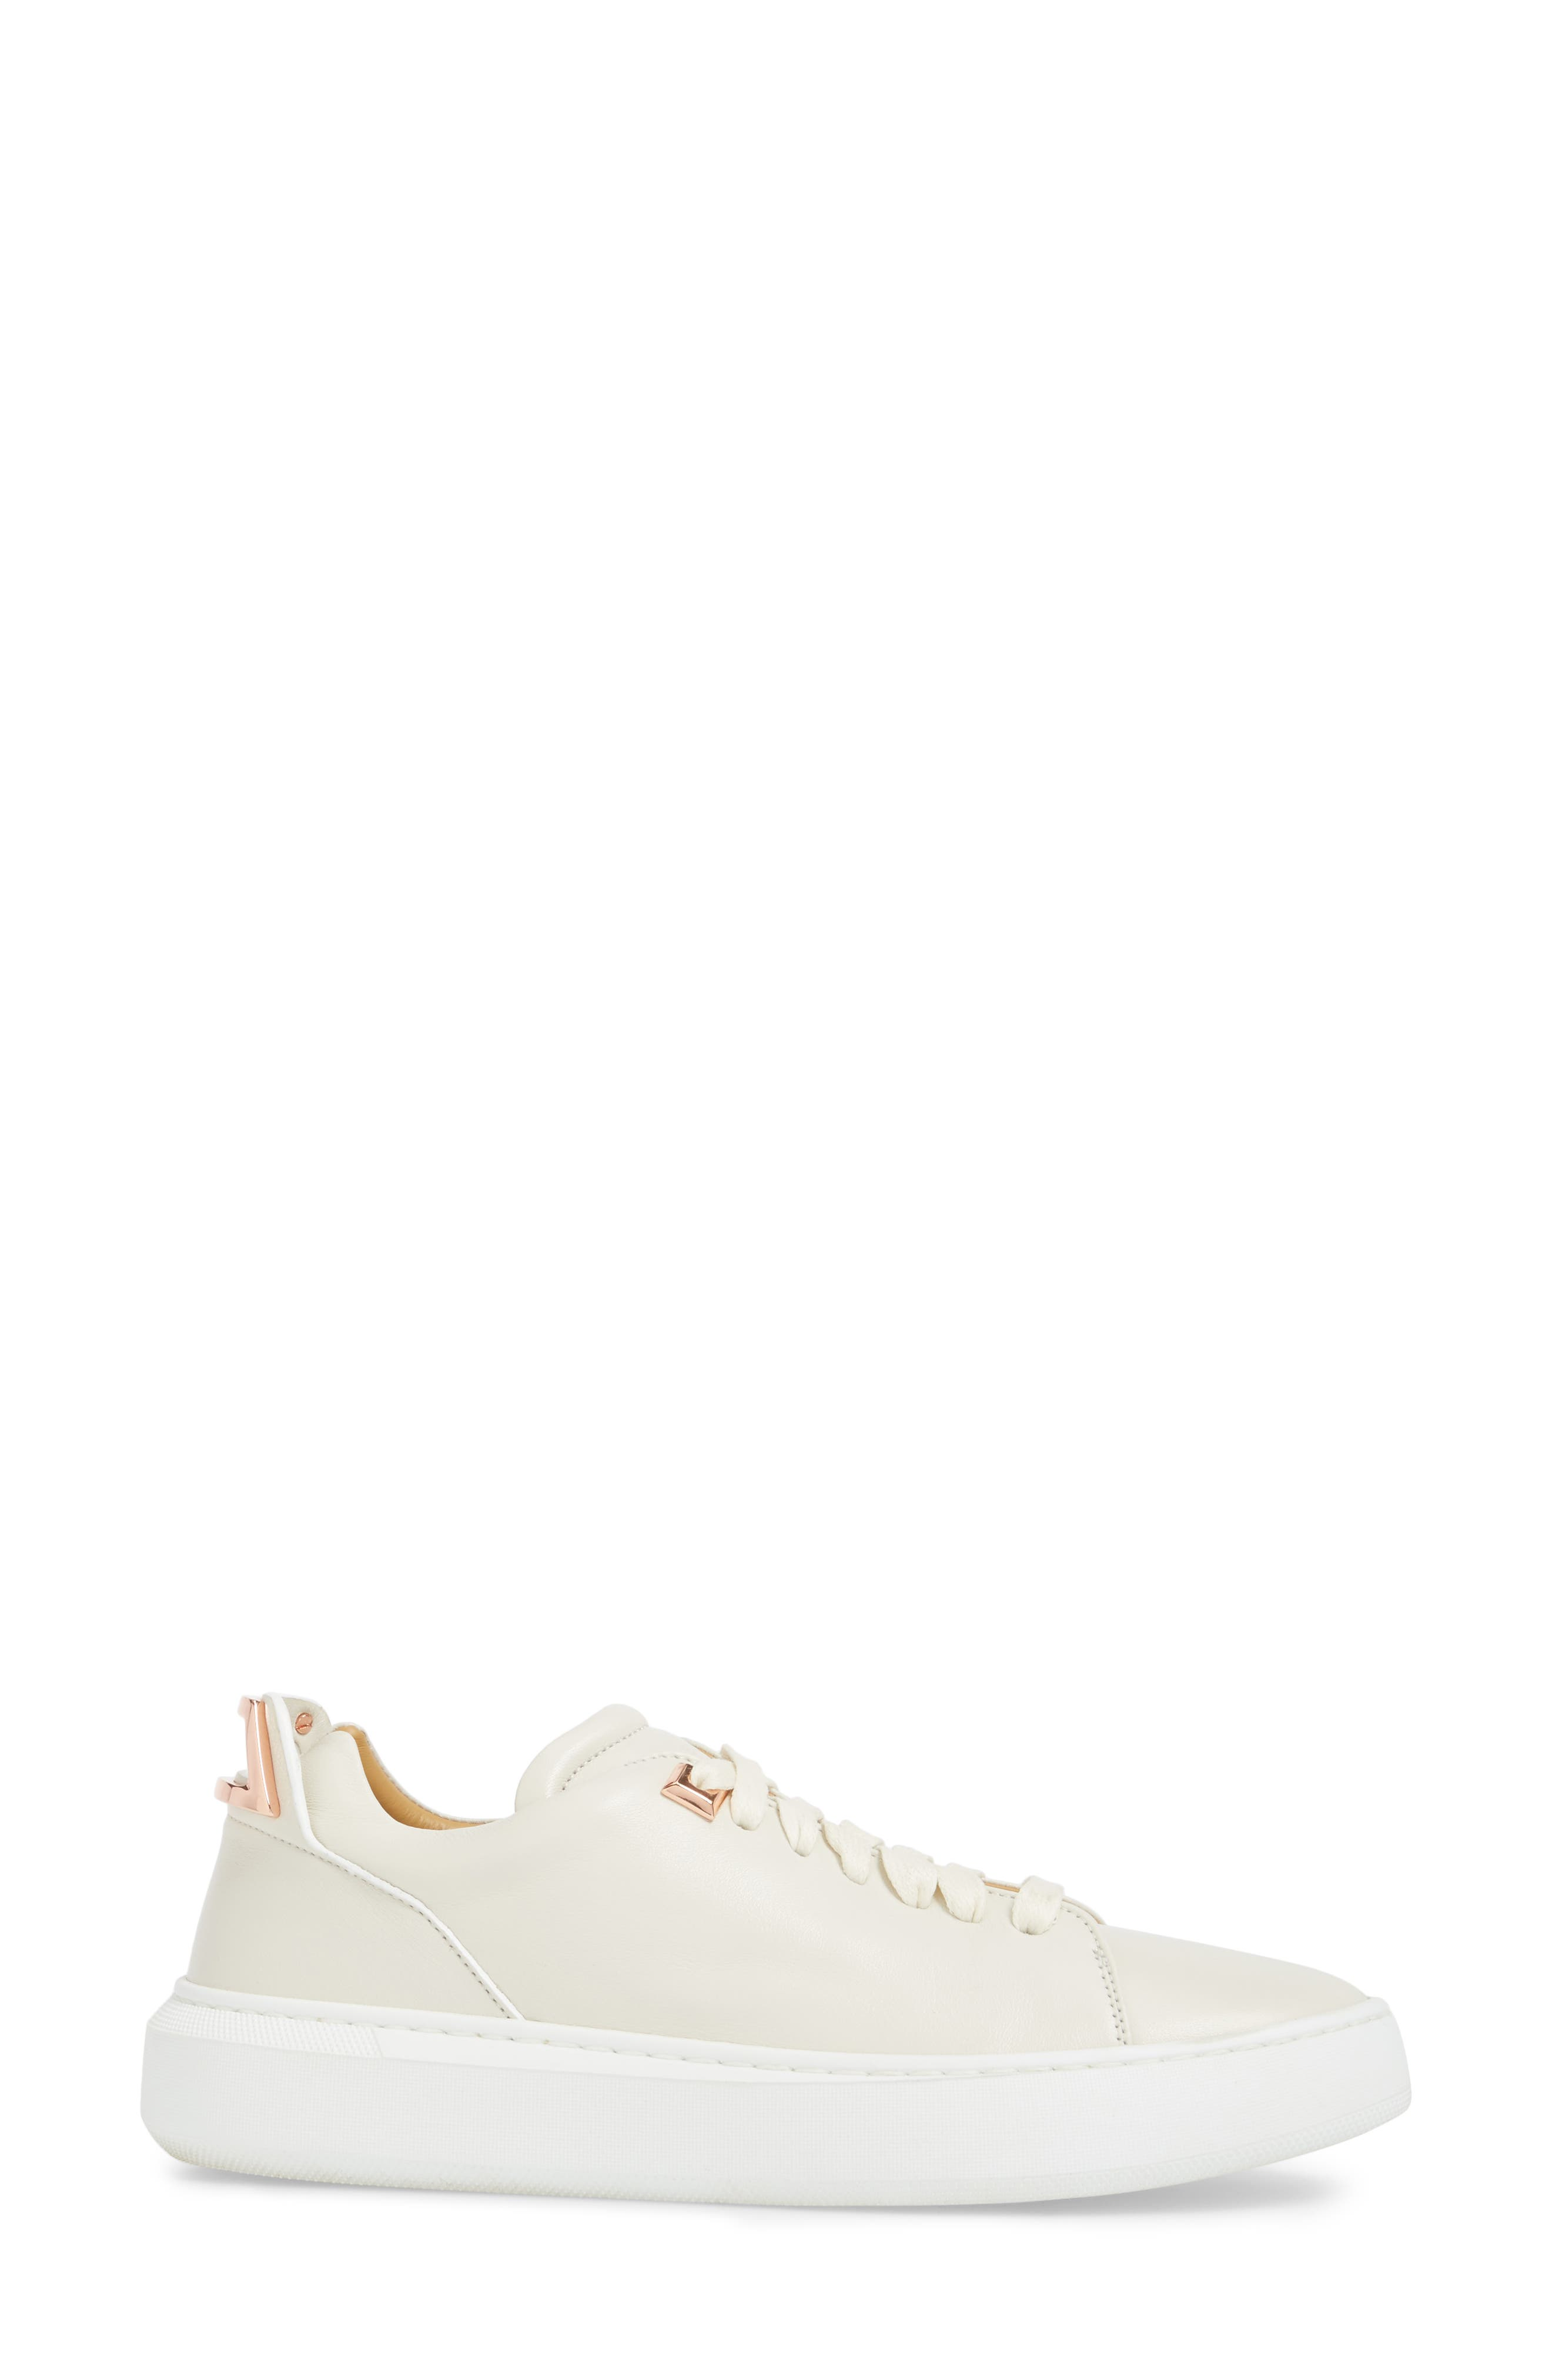 Uno Low Top Sneaker,                             Alternate thumbnail 6, color,